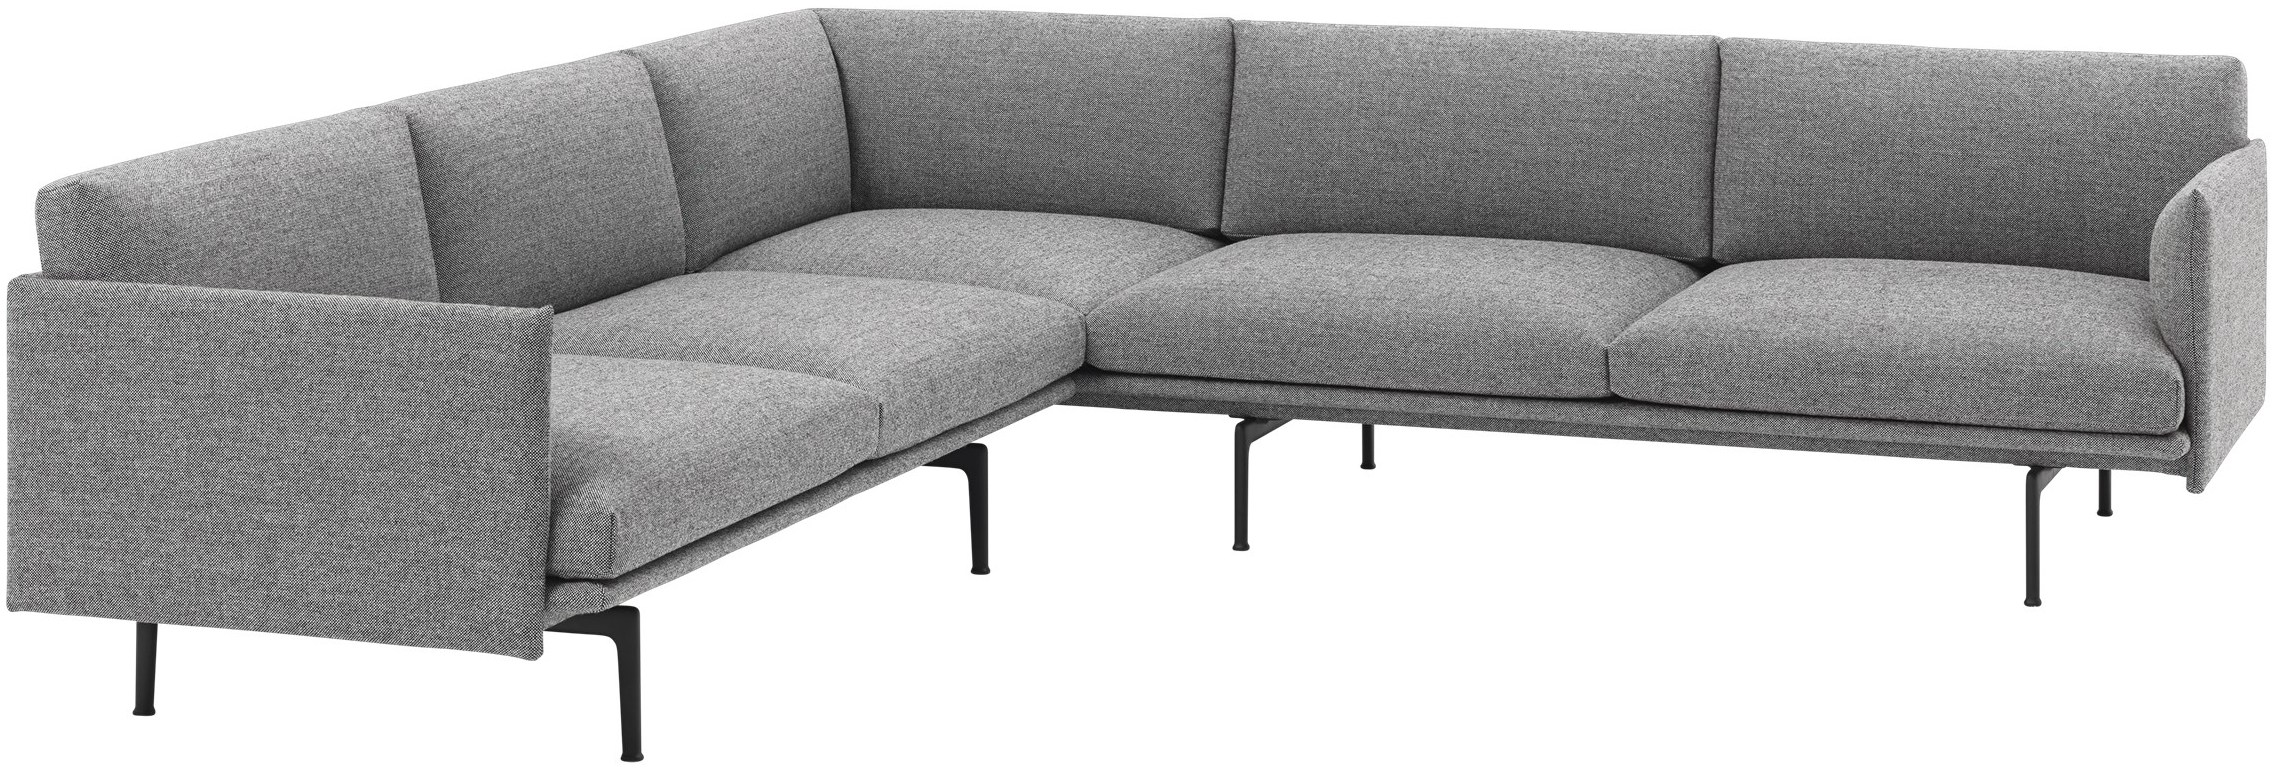 Full Size of Muuto Oslo Sofa 2 Seater Rest Outline Sofabord Airy Compose Dimensions Connect Uk Corner Design Anderssen Voll Polyrattan Petrol Ektorp Xxl Grau Modulares Sofa Muuto Sofa